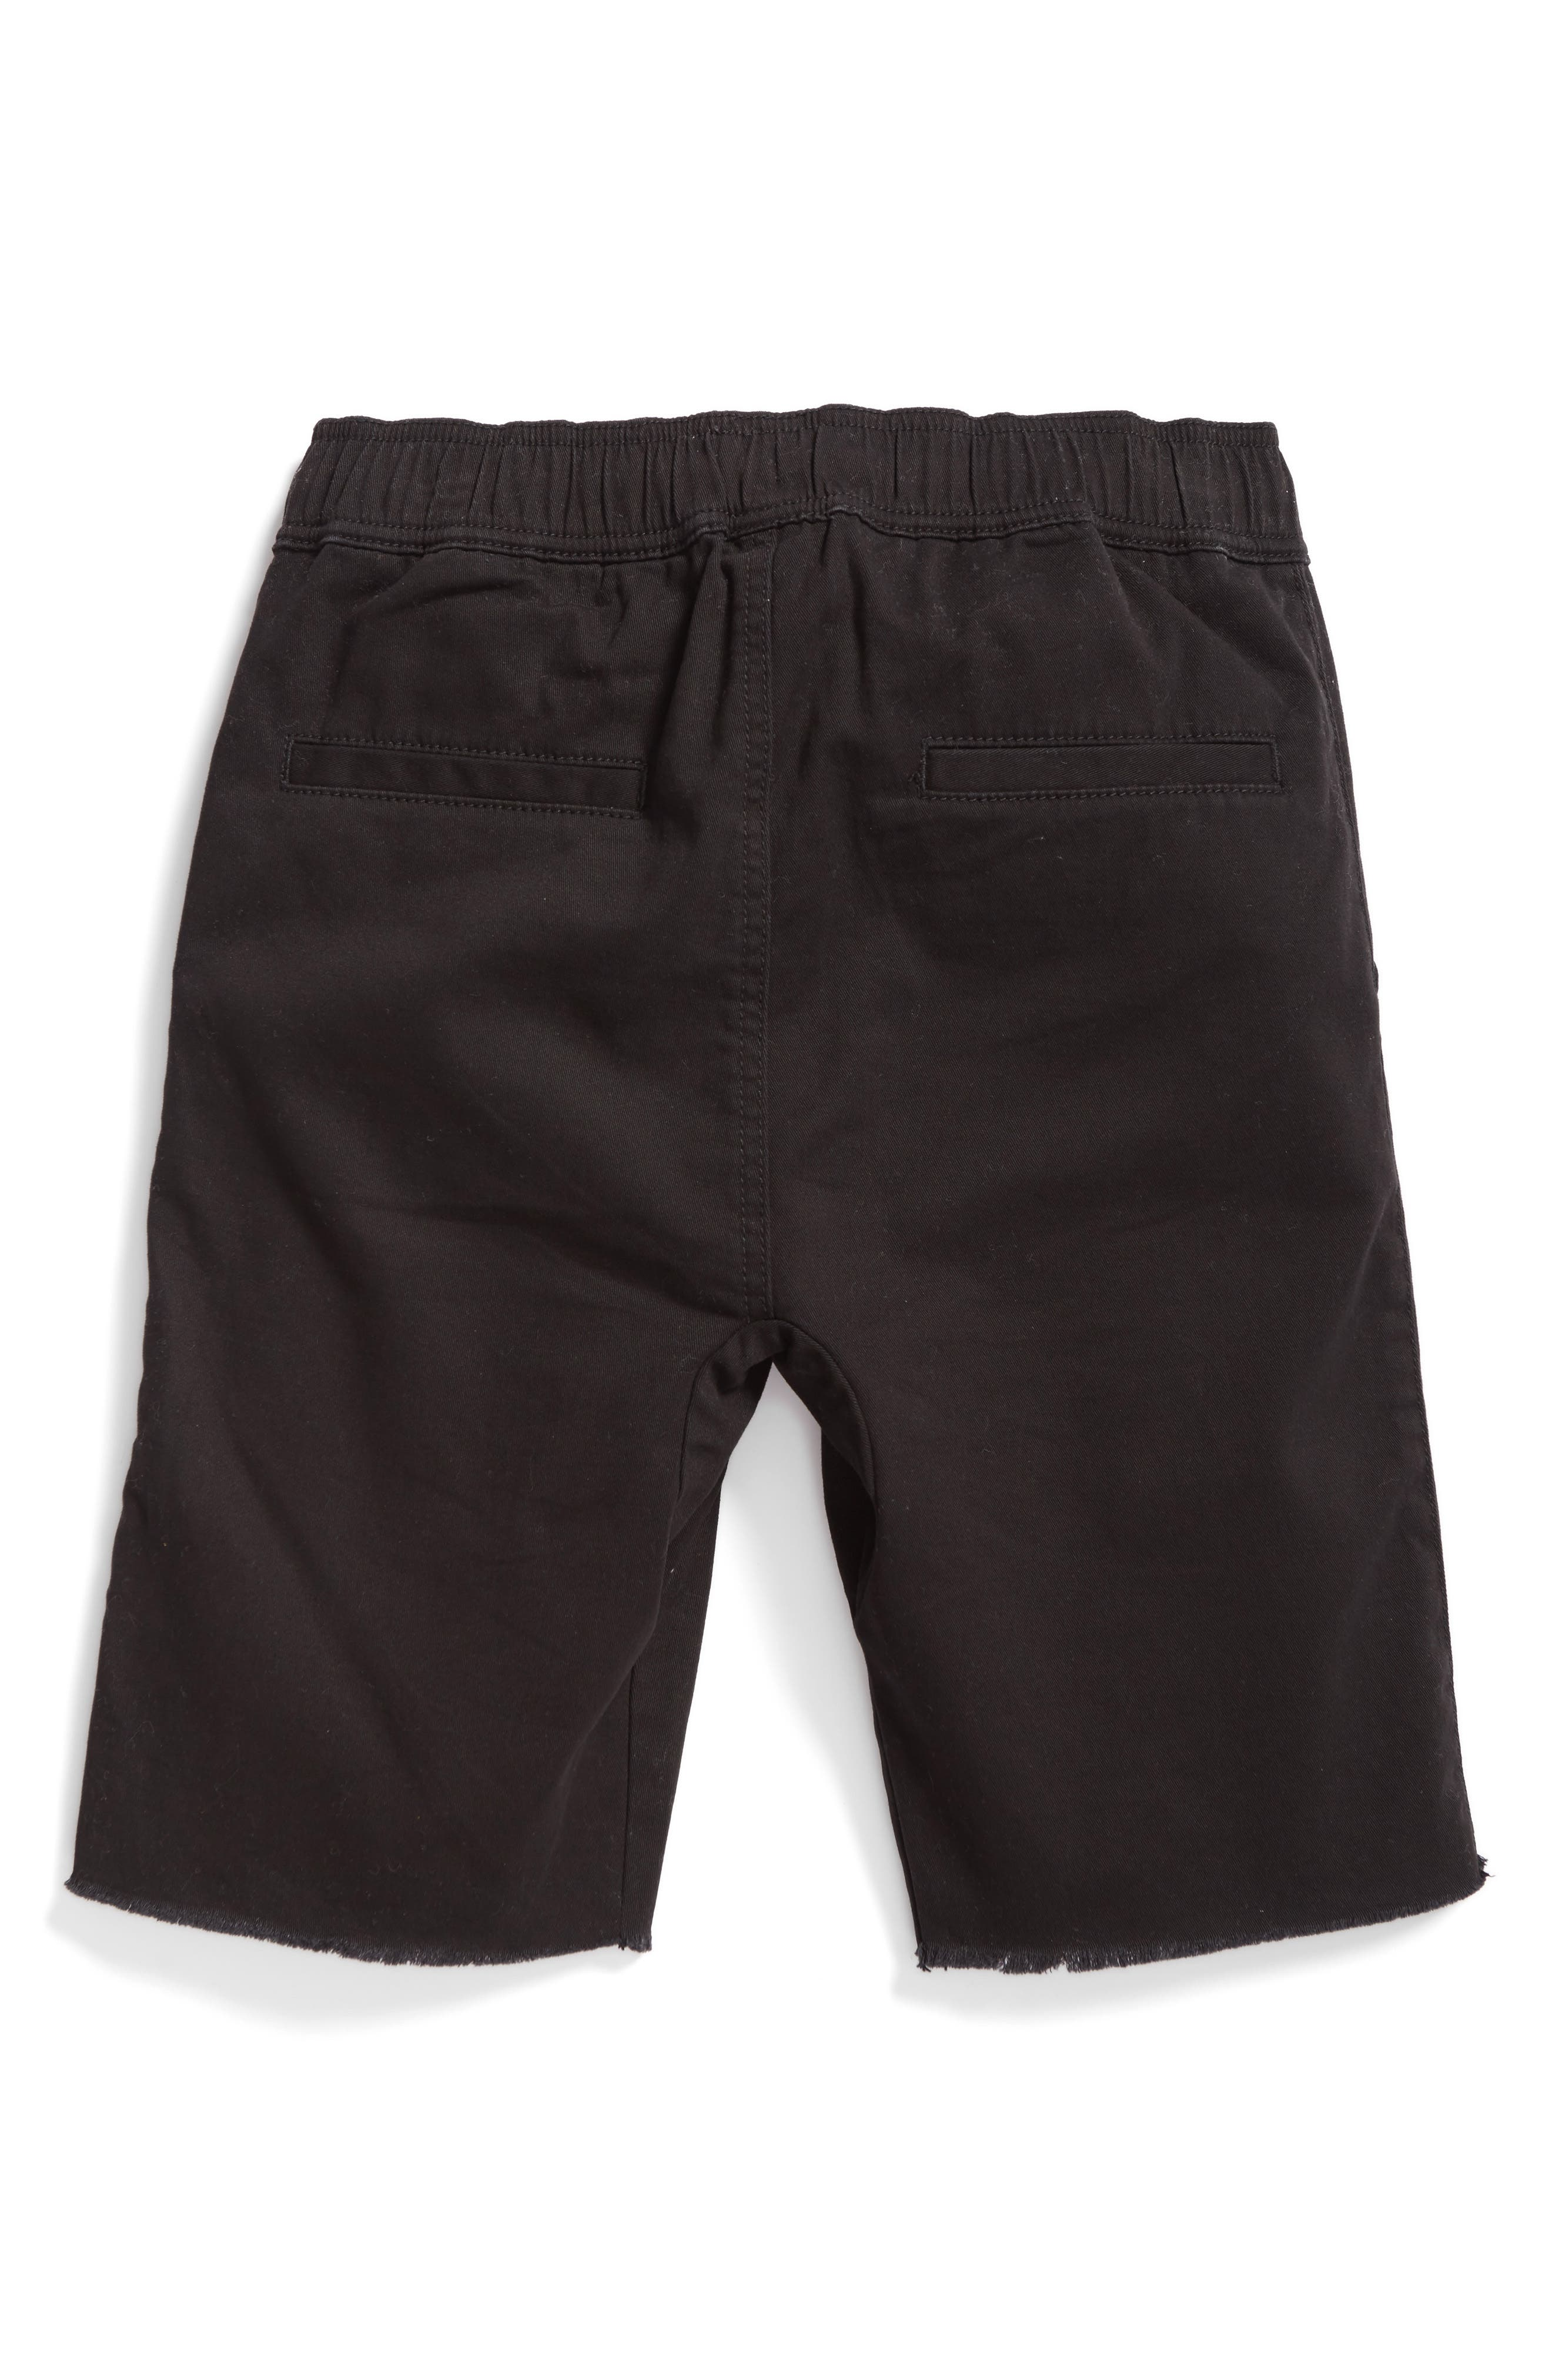 Alternate Image 2  - Tucker + Tate Jogger Shorts (Big Boys)